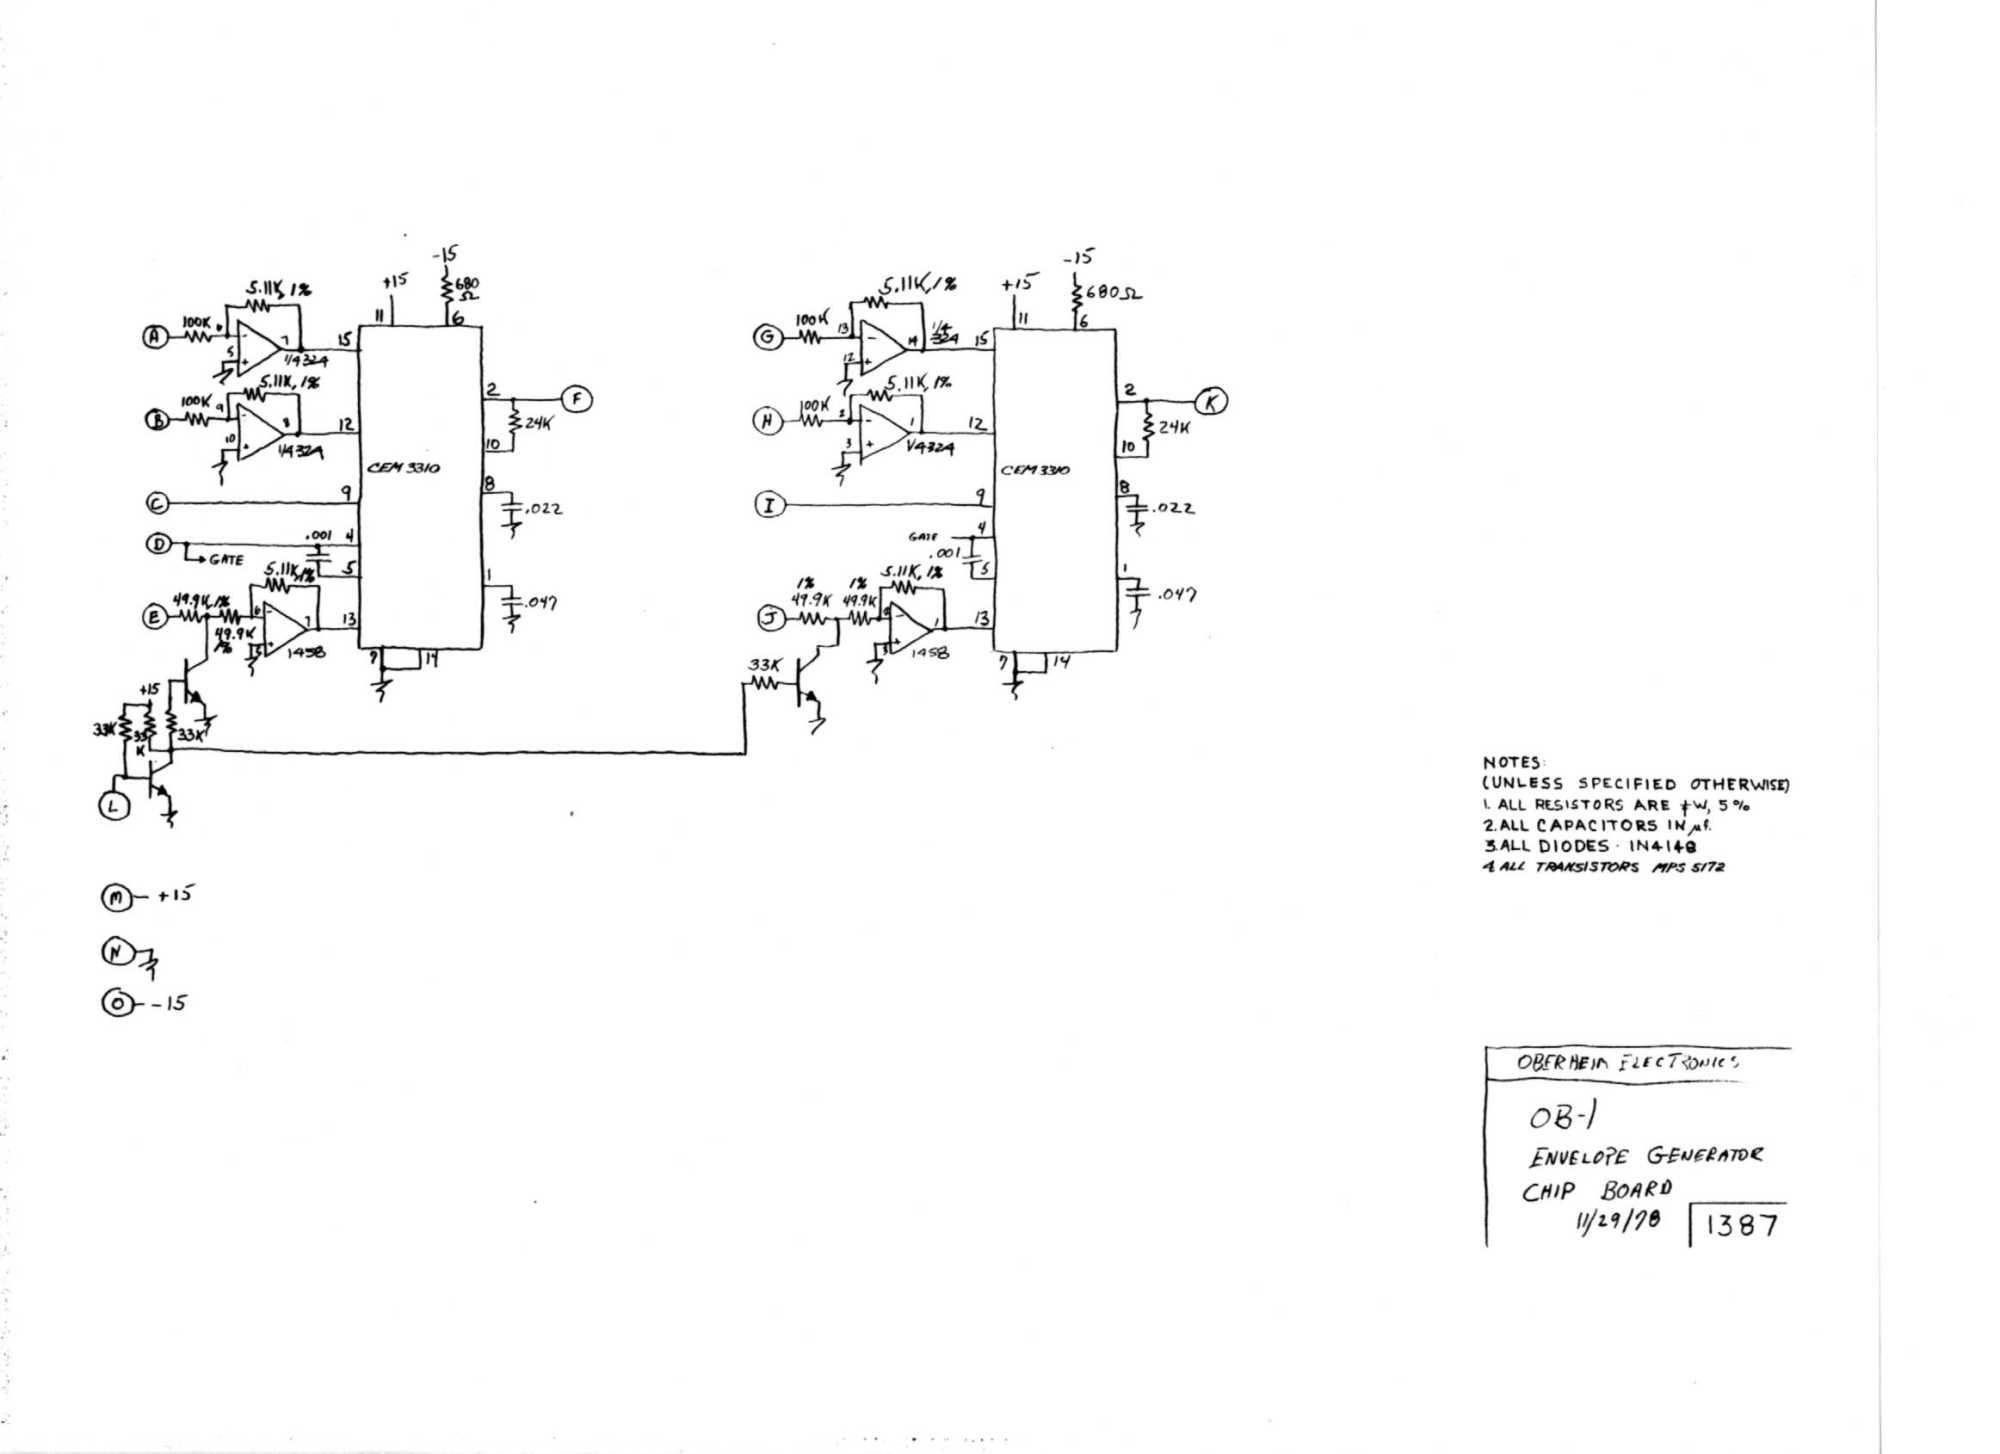 hight resolution of  schematic ob 1 envelope generator chip board